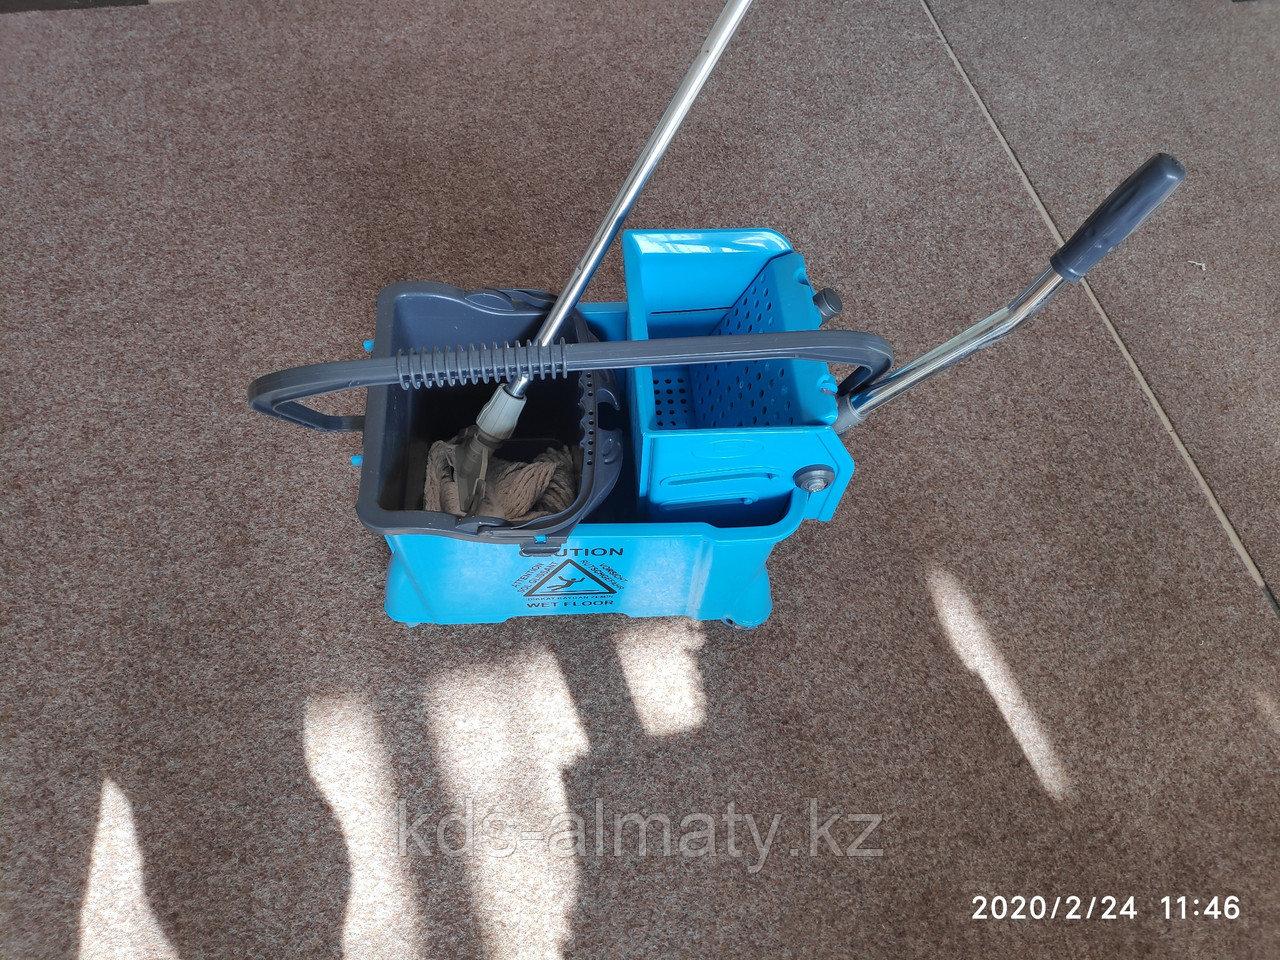 Тележка для уборки (для клининга) без швабры